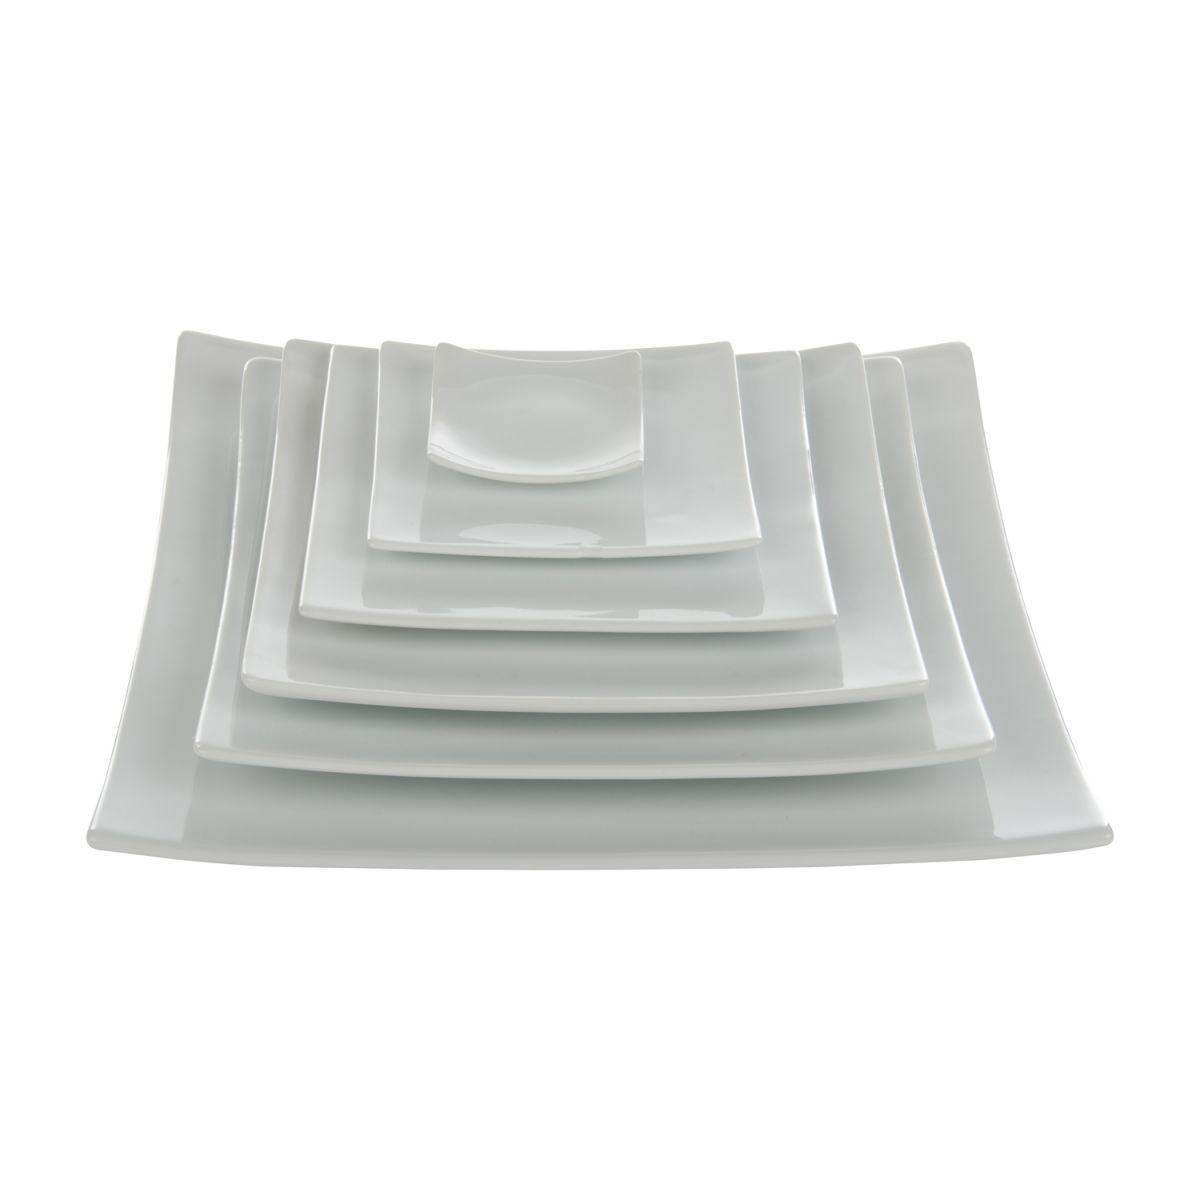 bord porselein vierkant wit 28 x 28 cmbox 3